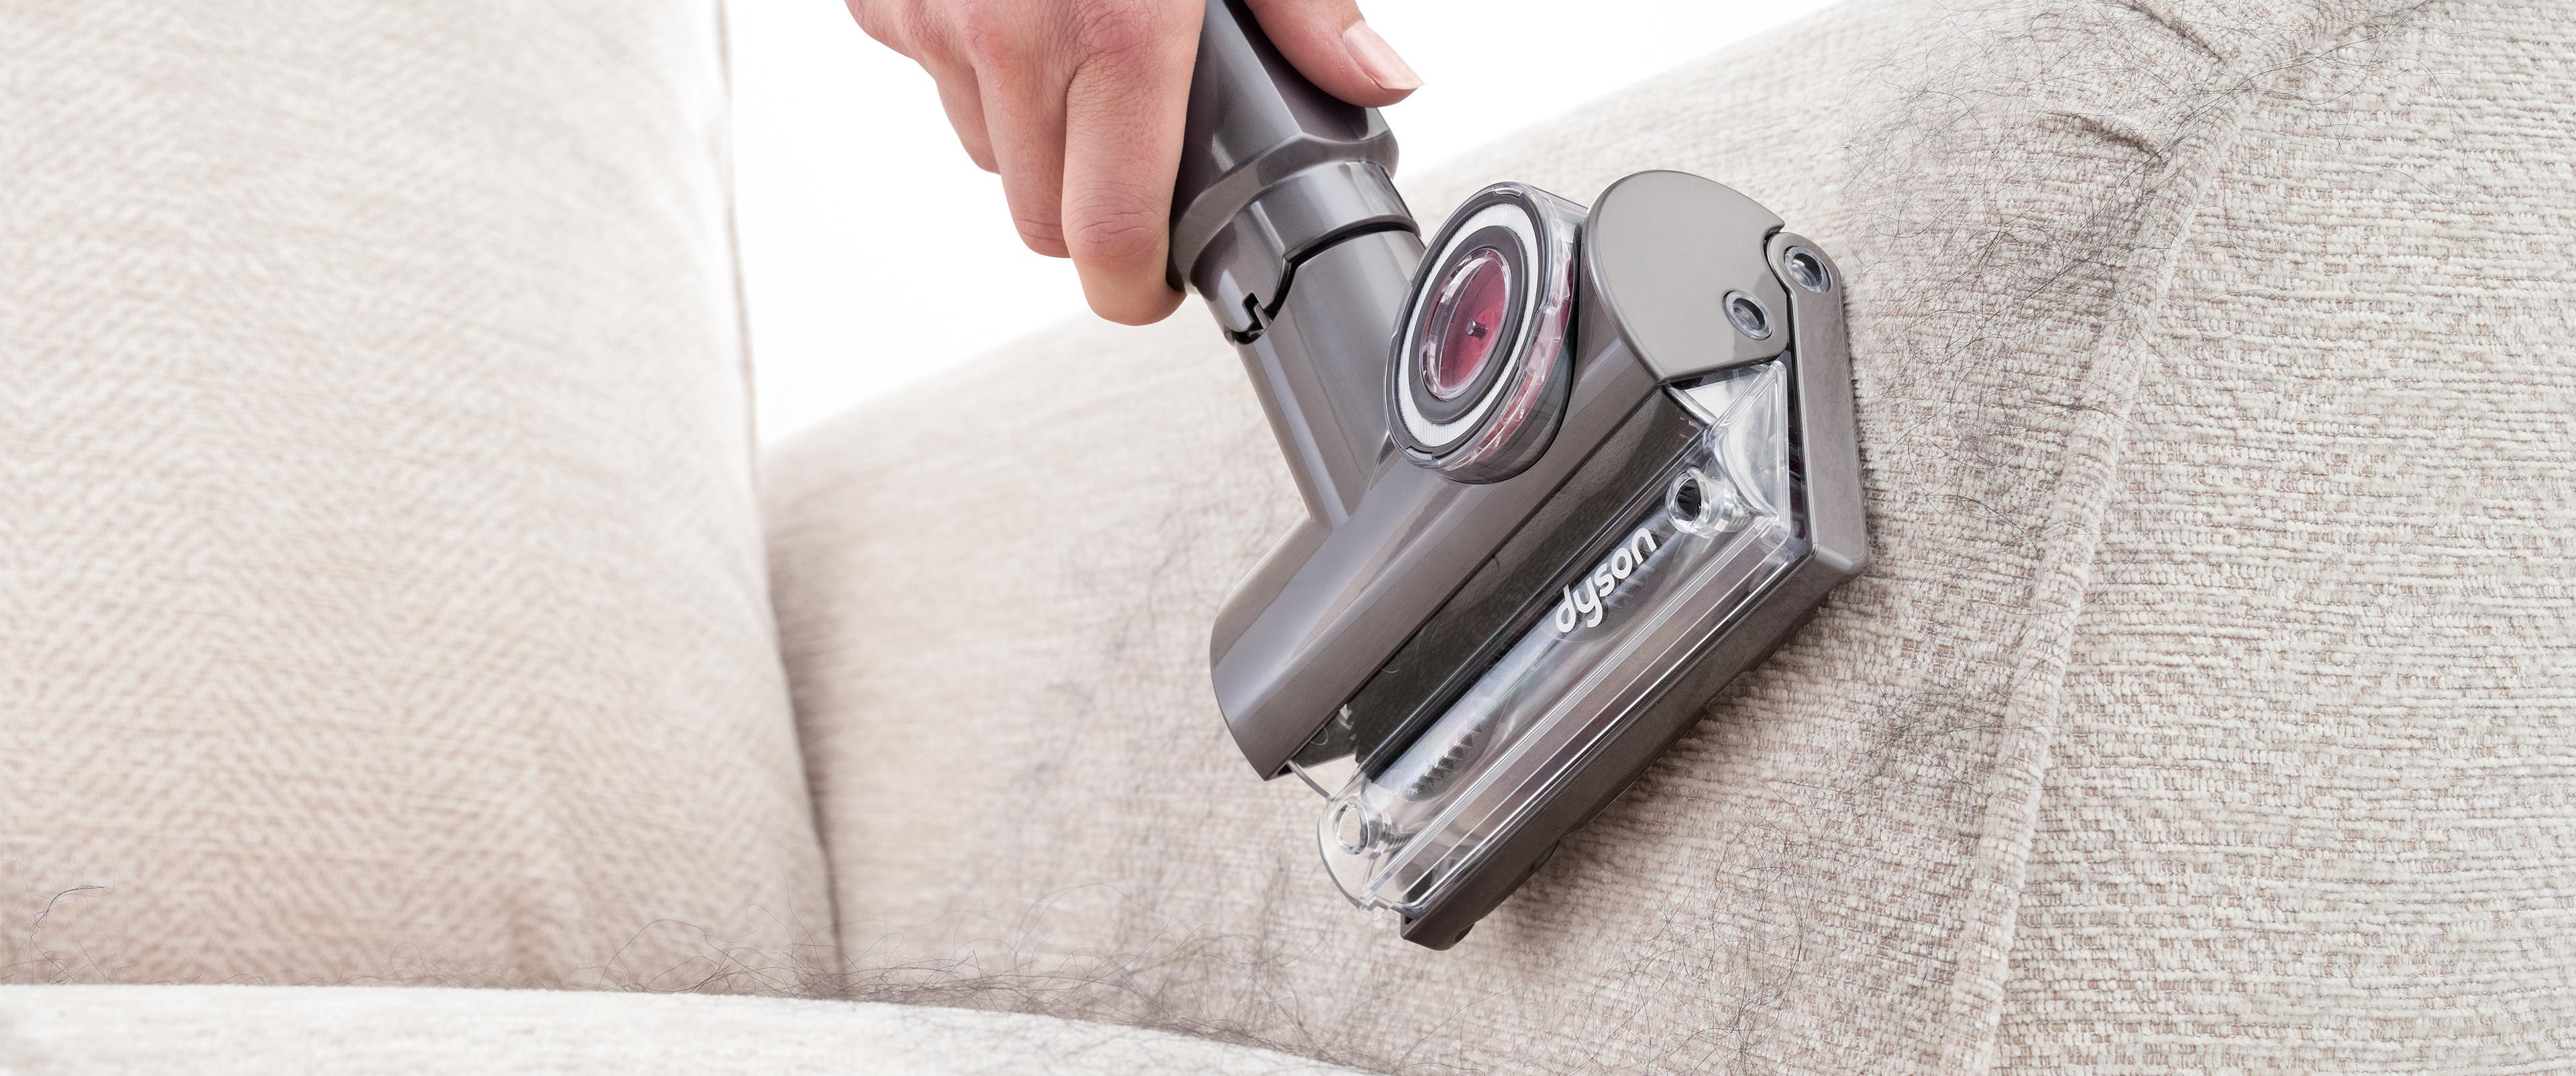 Tangle-free Turbine tool on sofa arm